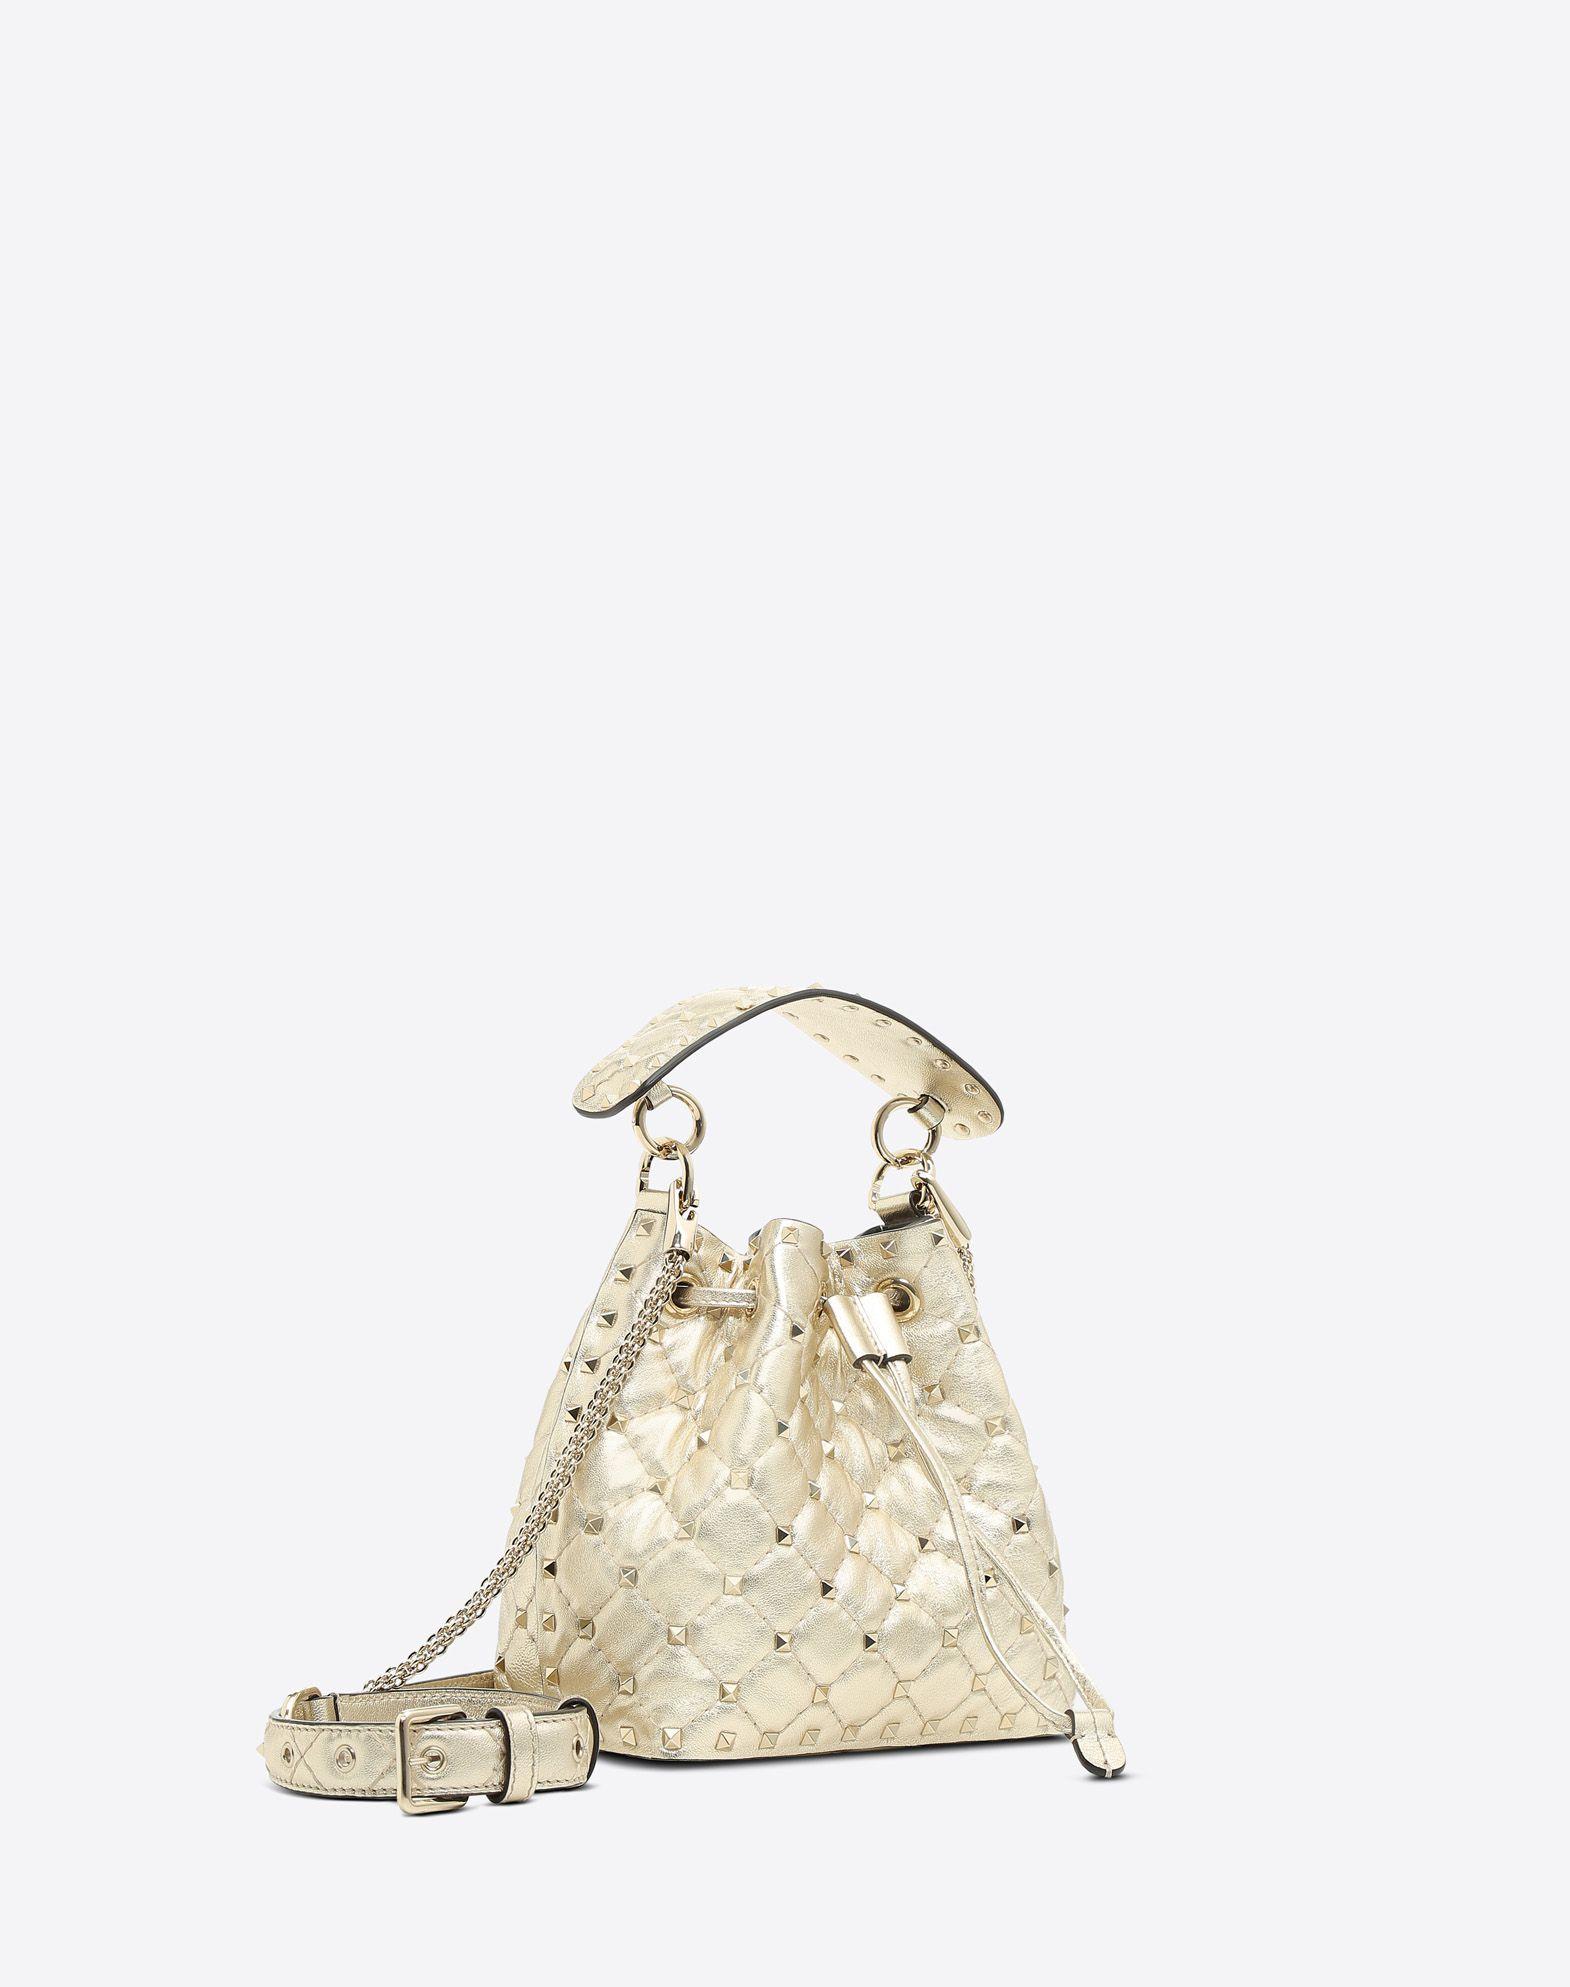 VALENTINO GARAVANI Rockstud Spike Small Bucket Bag  BUCKET BAG D r